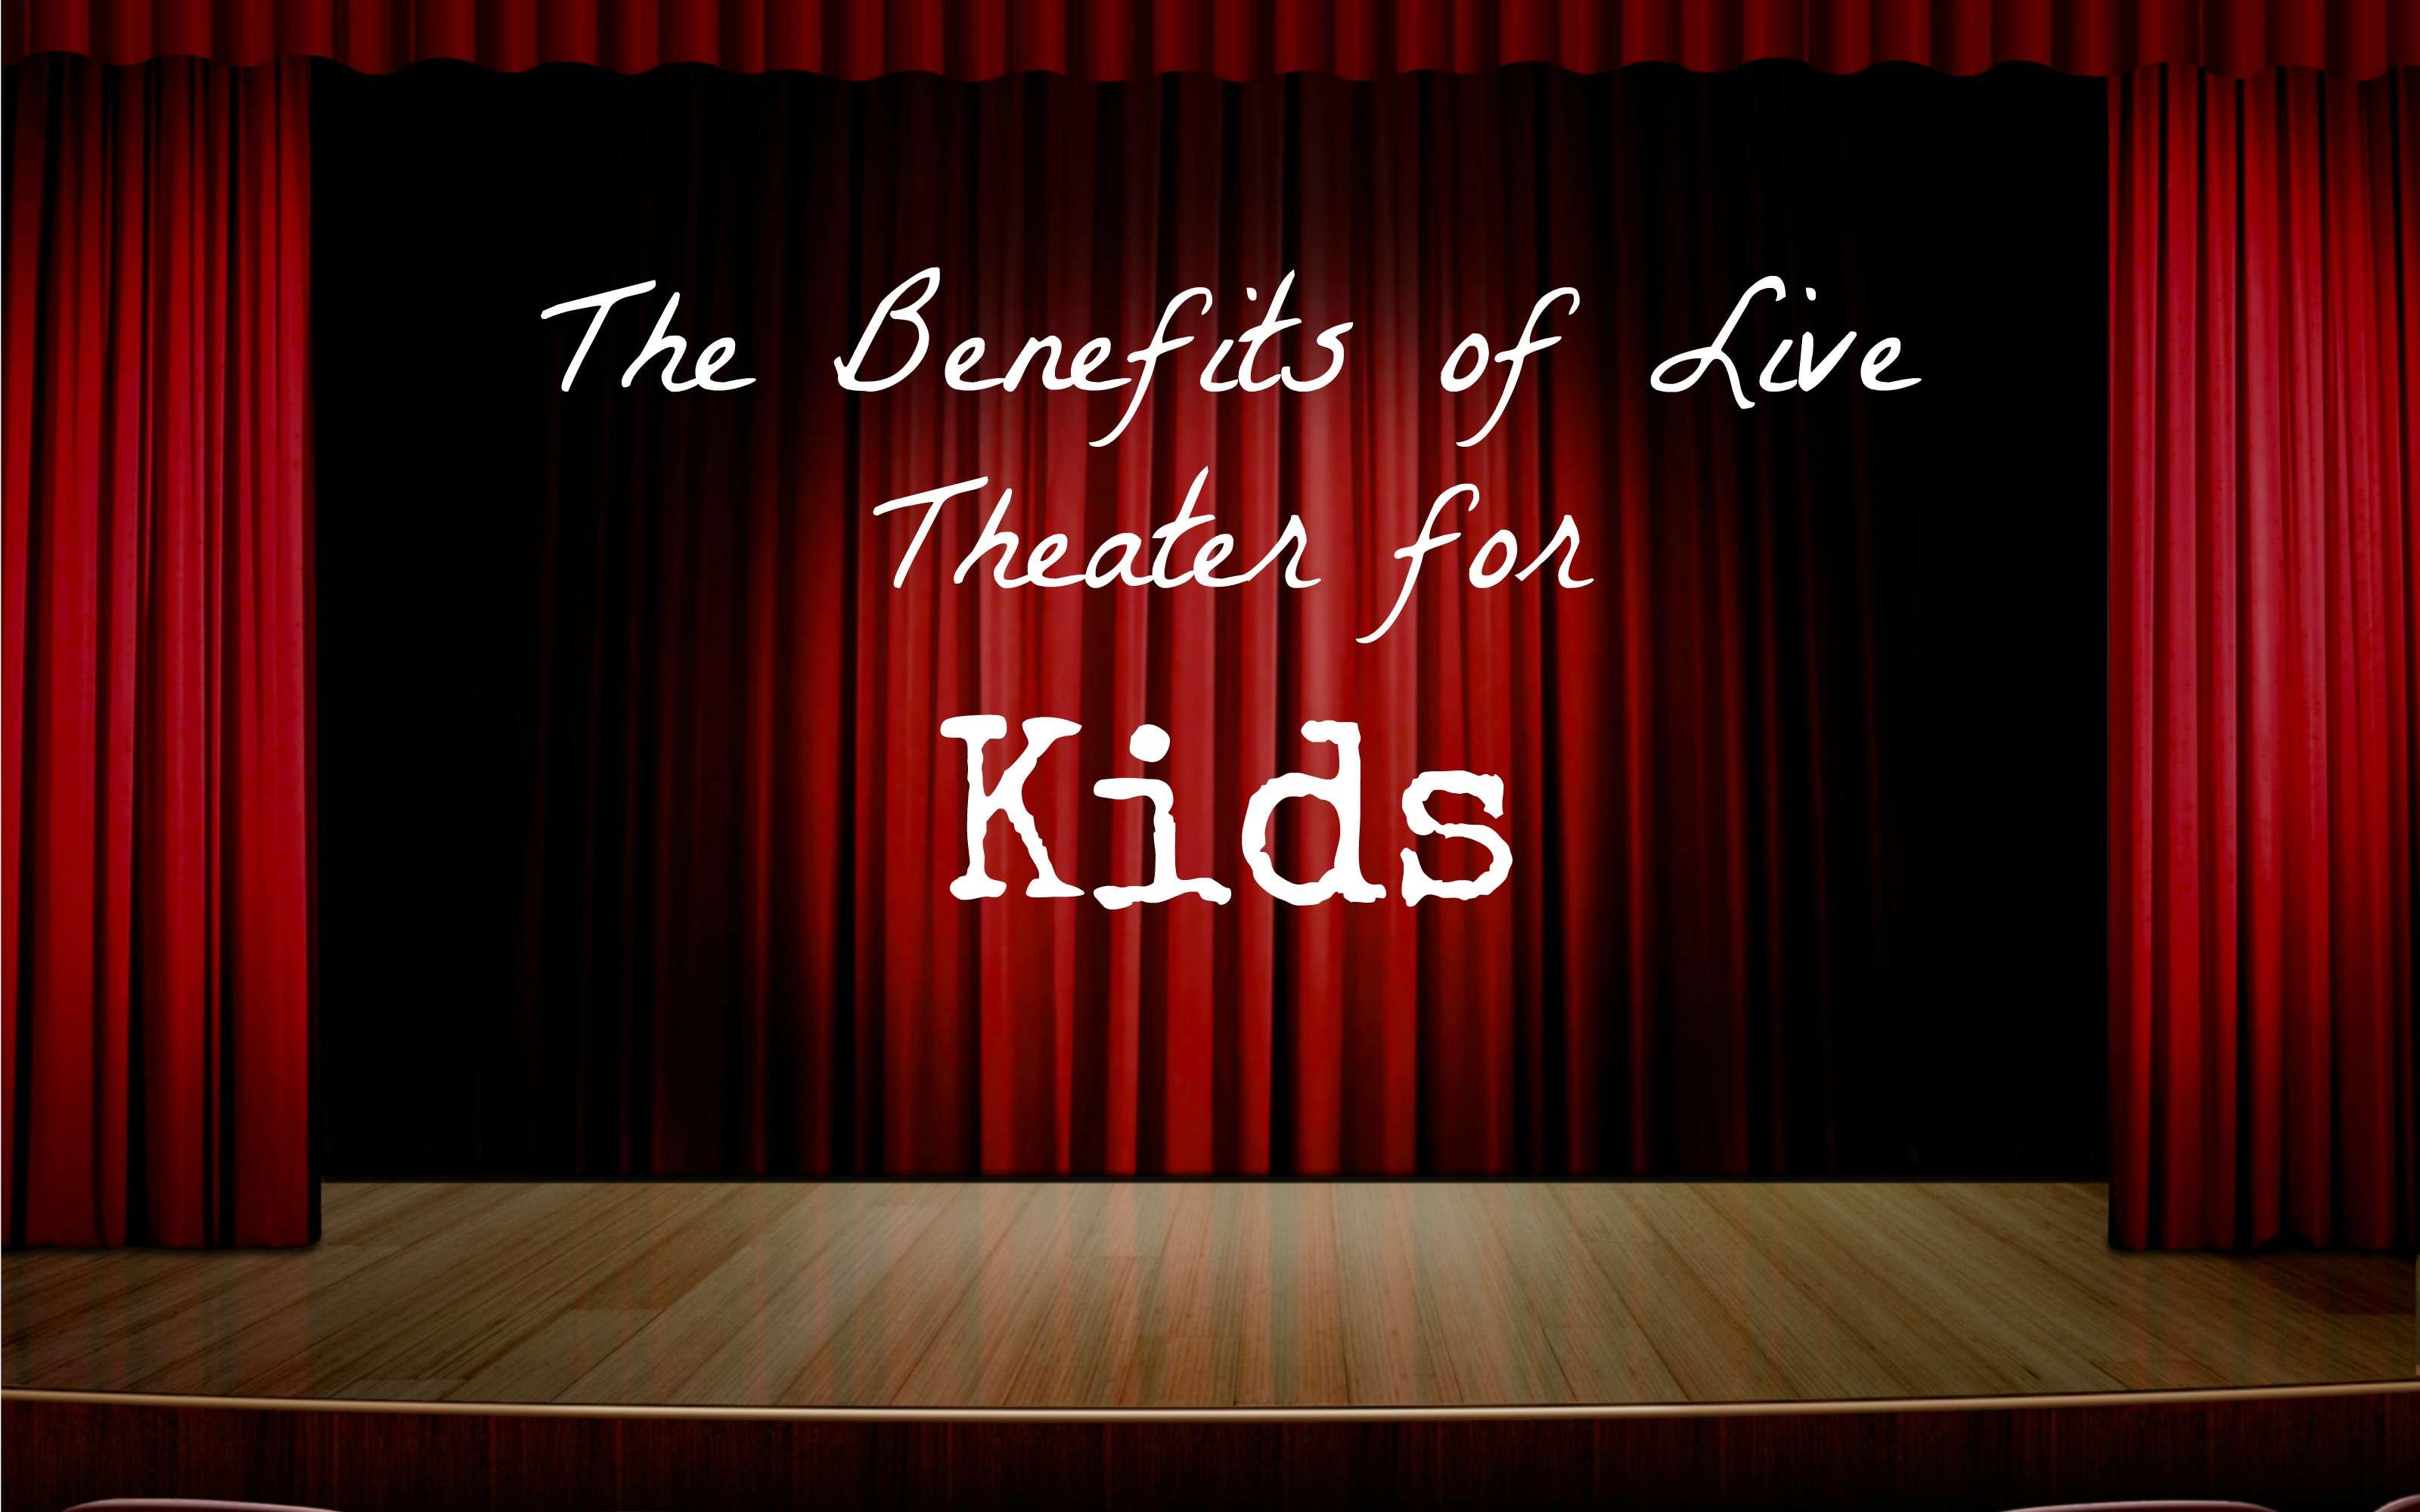 Benefits of music for children - 6 ways music benefits kids